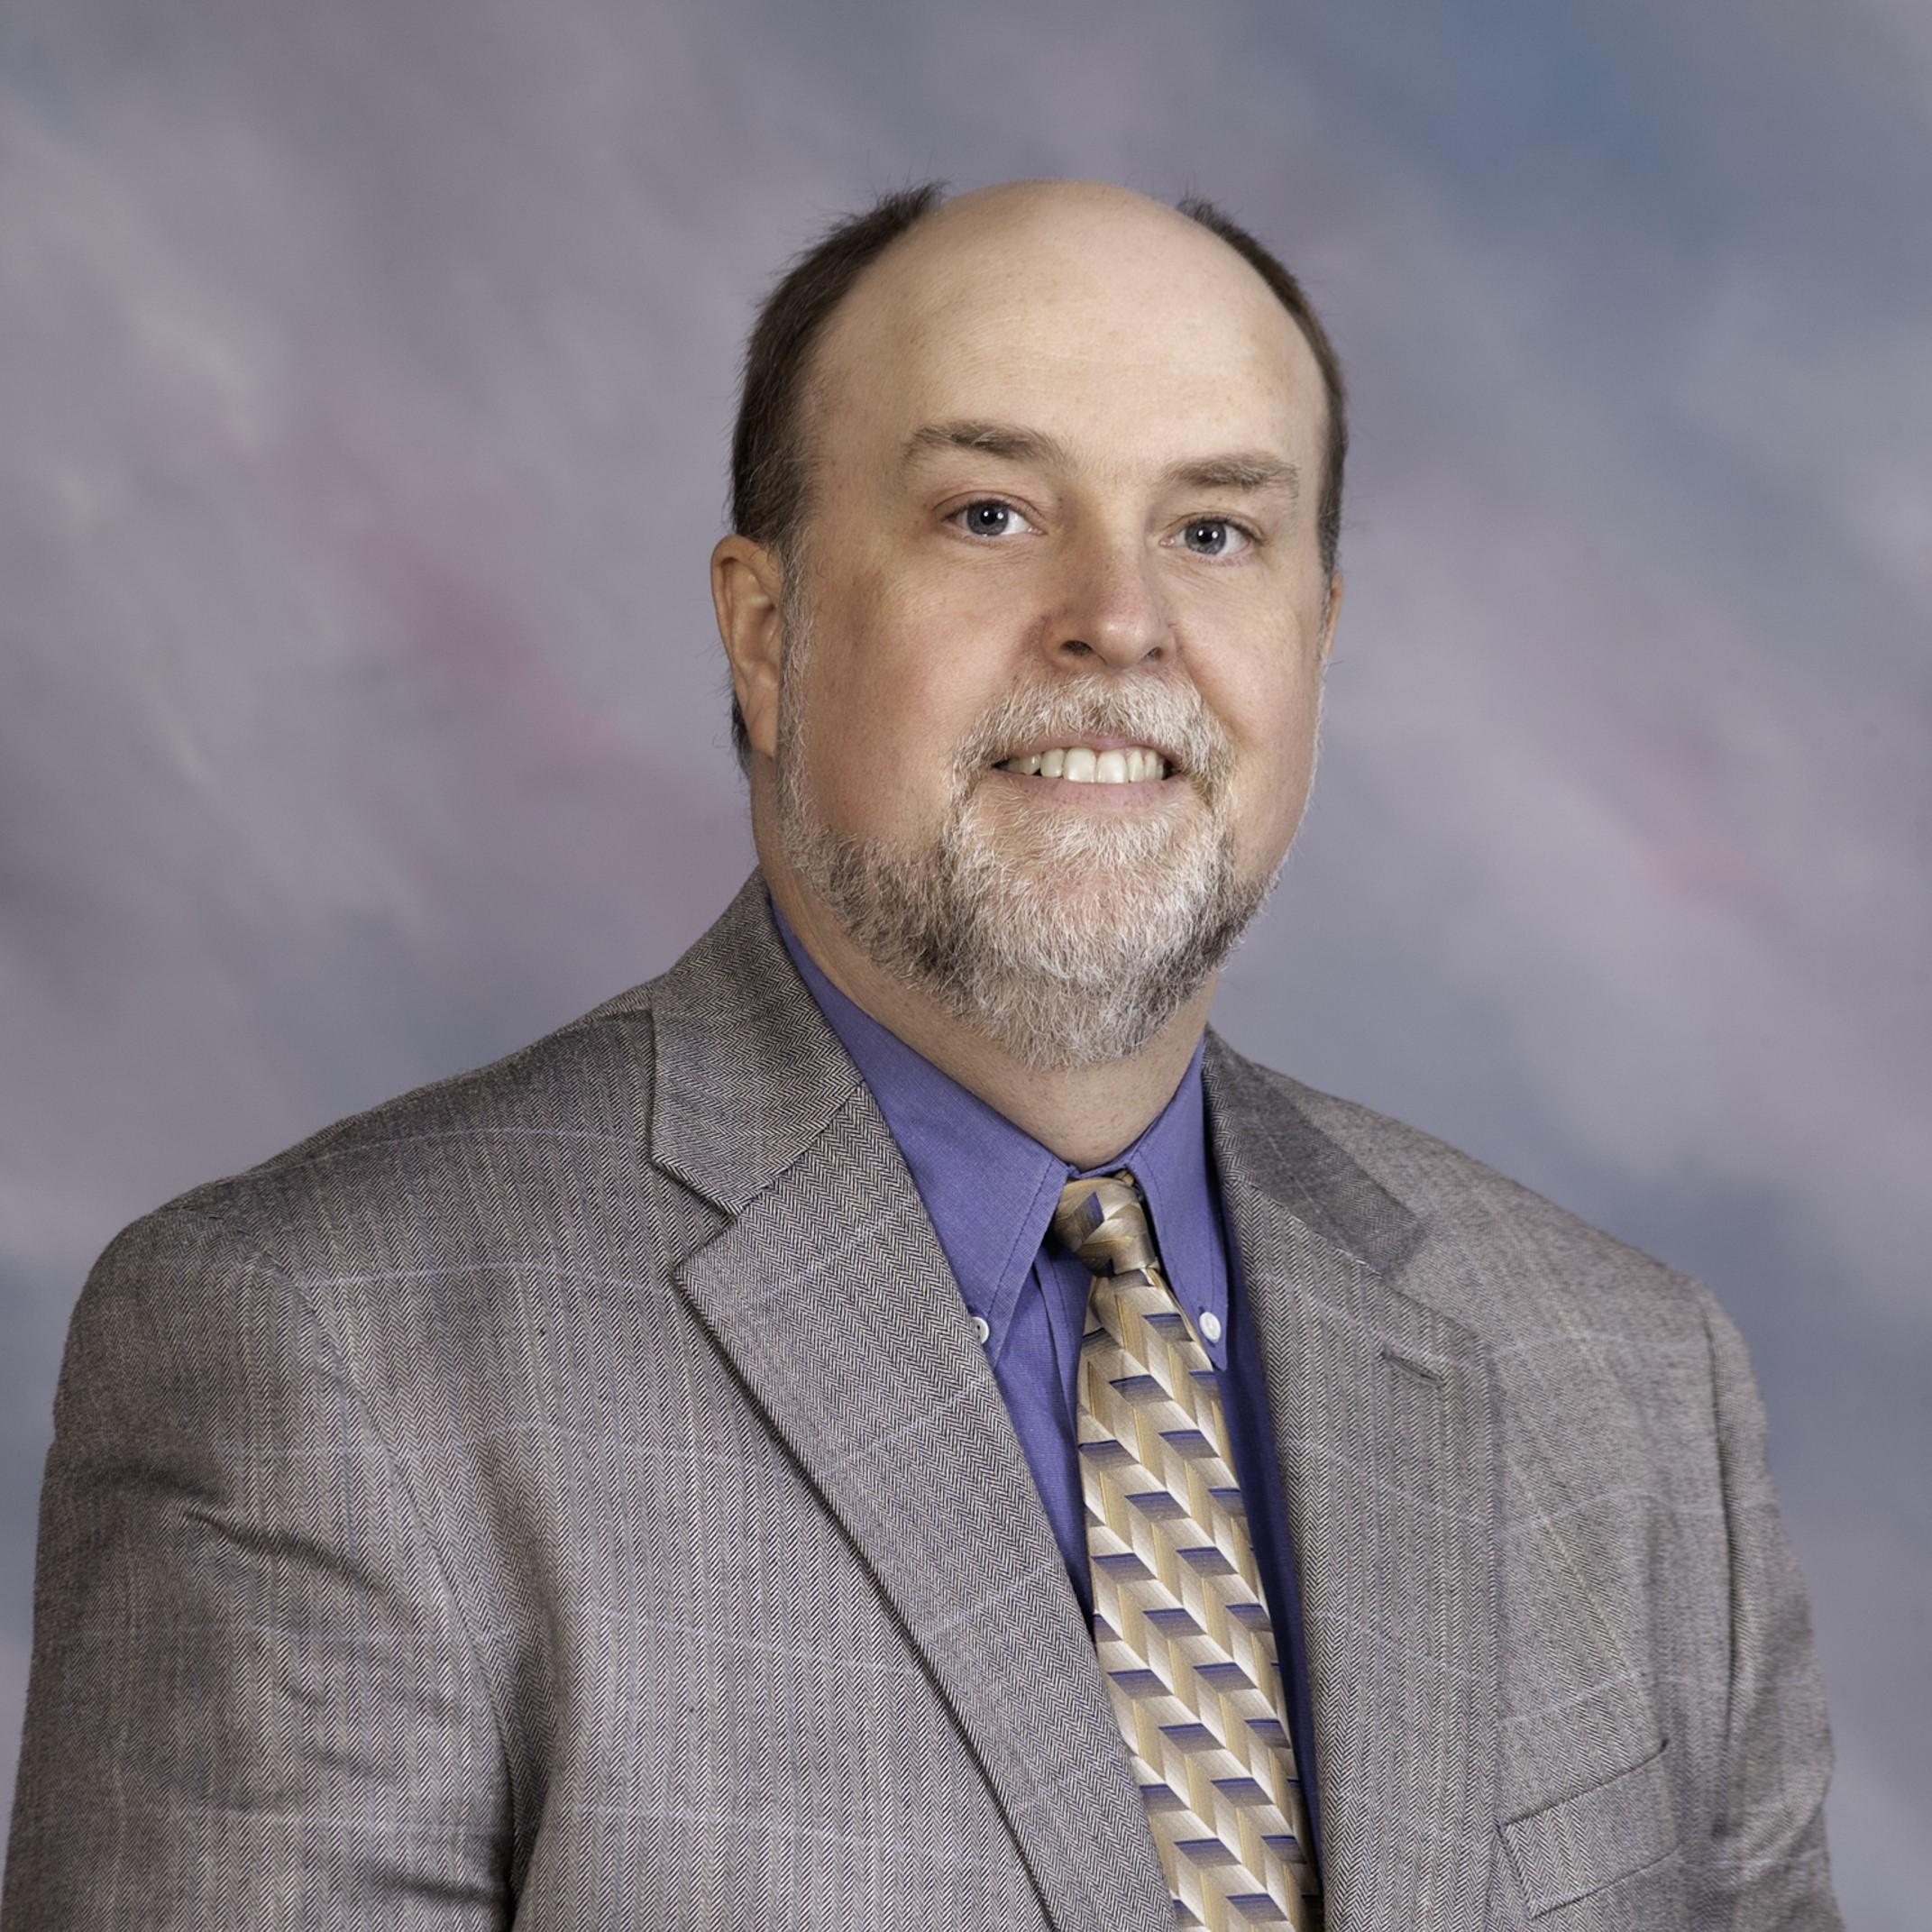 DENNIS J. FARRAR  Your Registered Representative & Insurance Agent